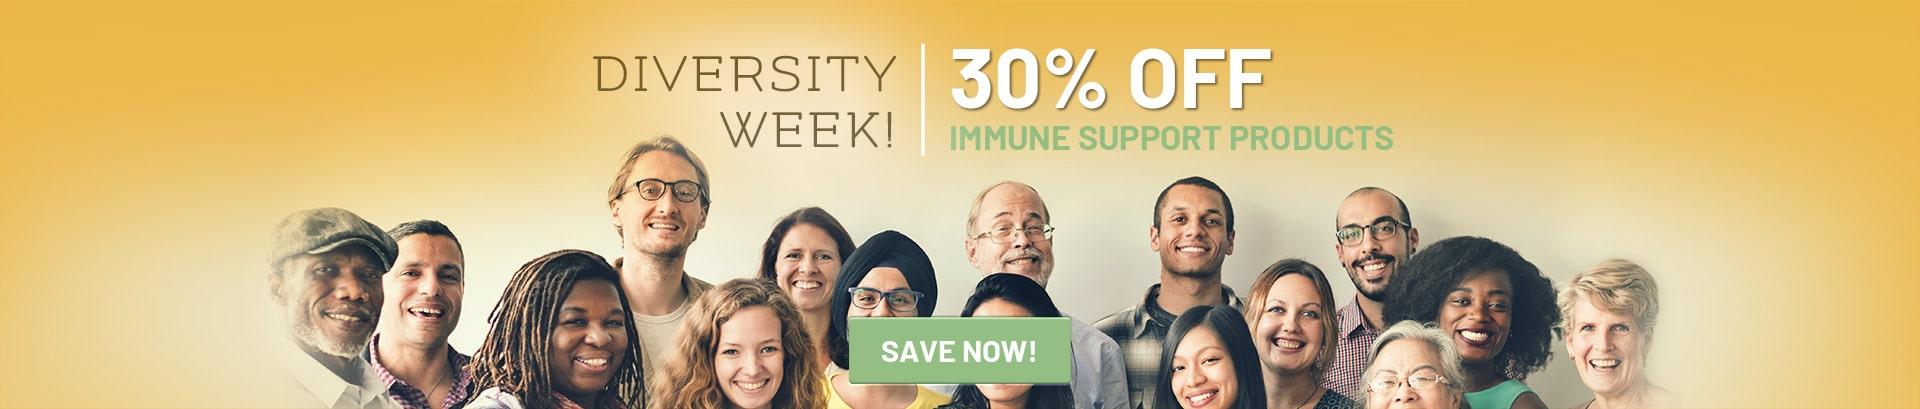 Diversity Week Sale Pure Hemp